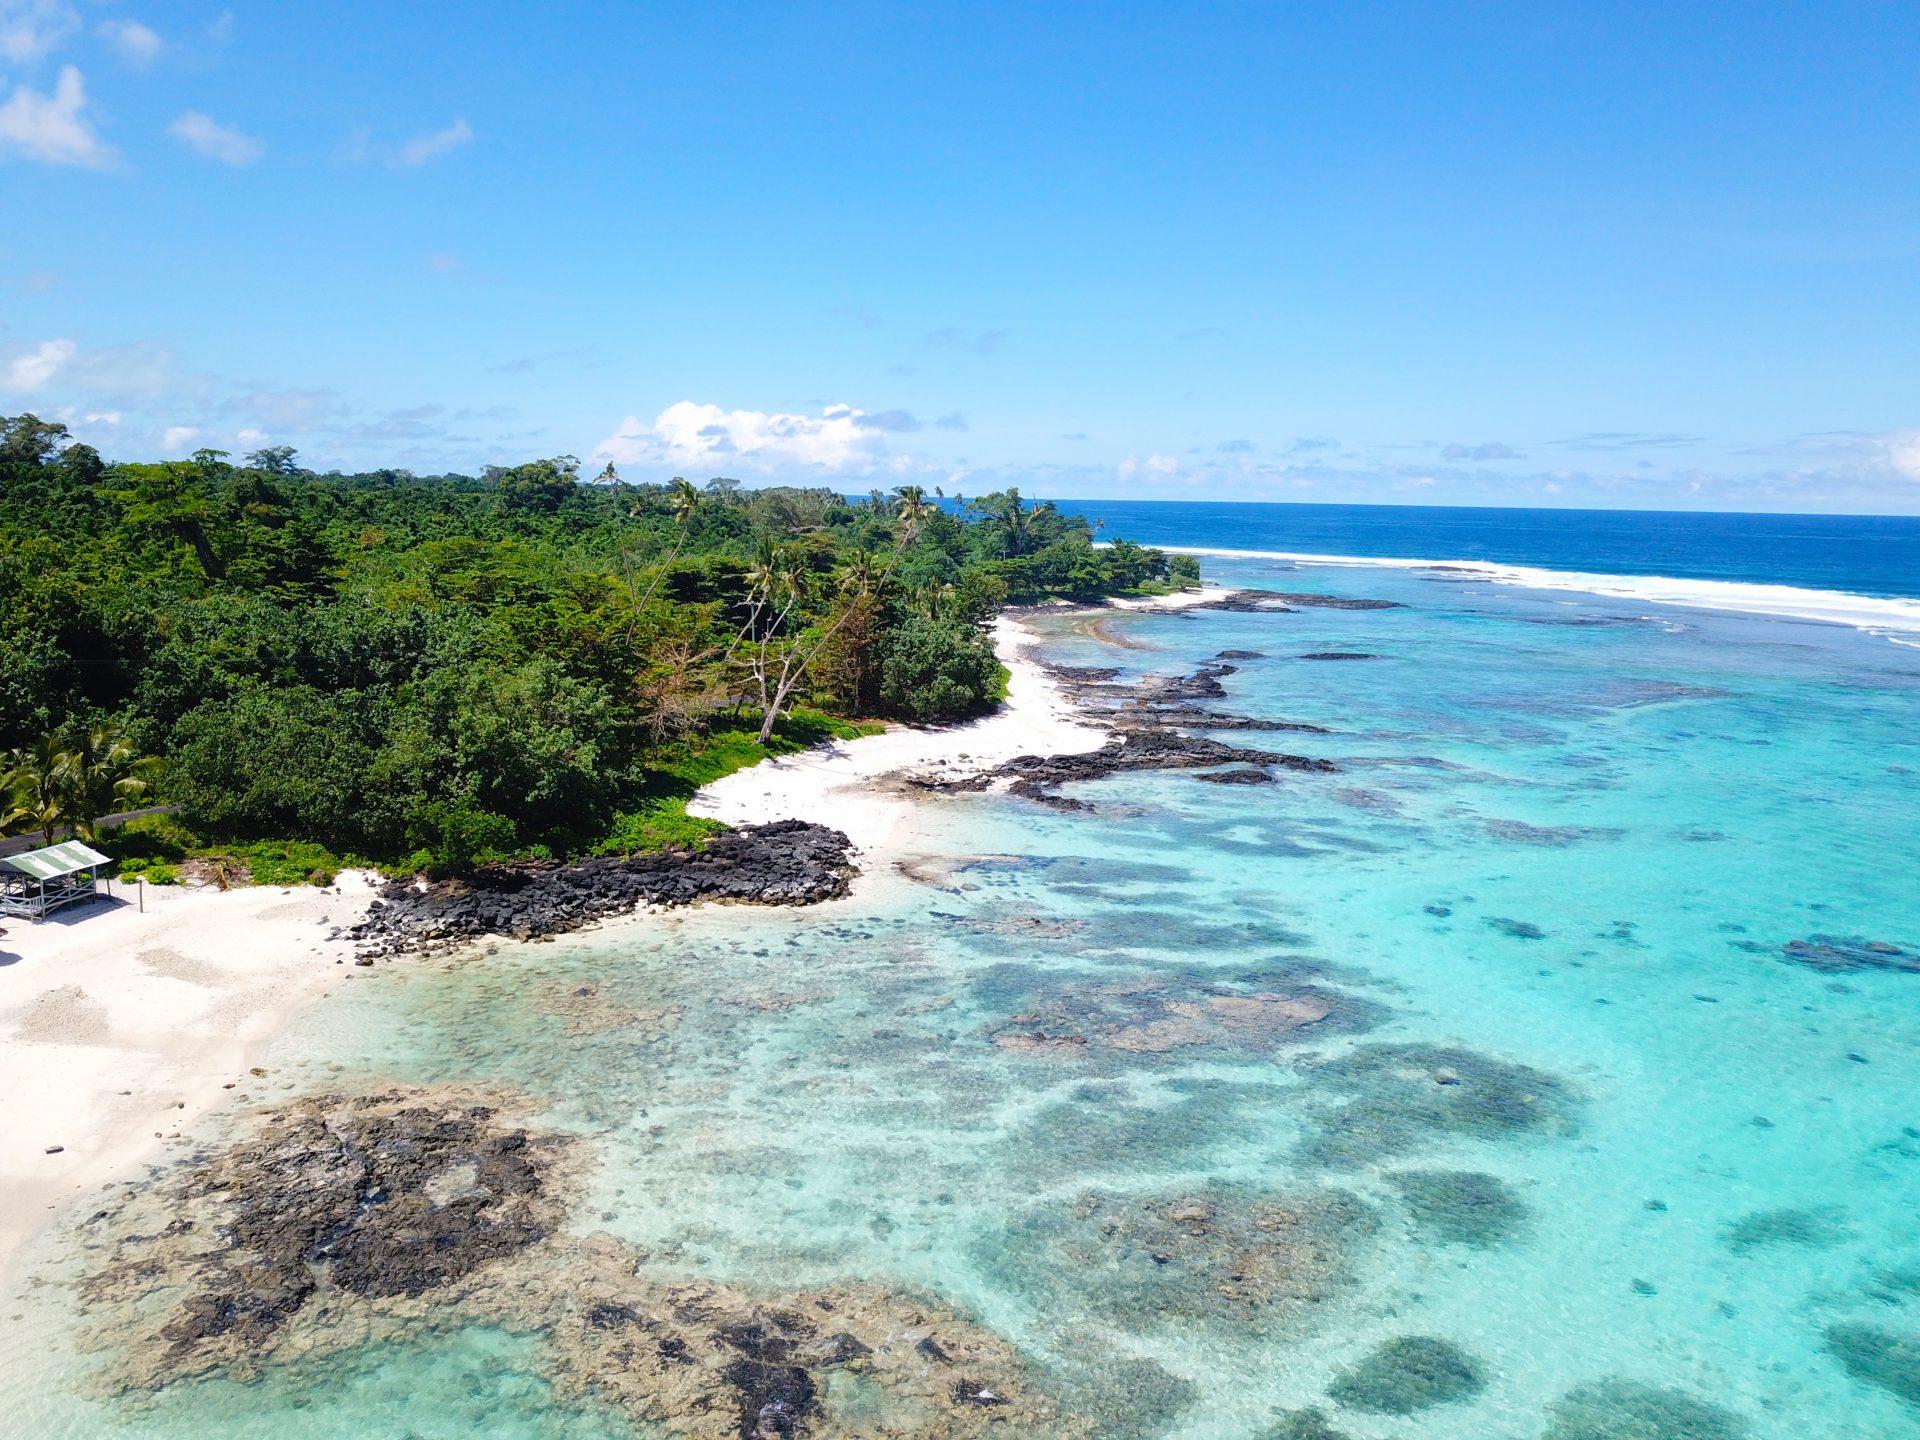 samoa island 7 day itinerary mylifesamovie.com